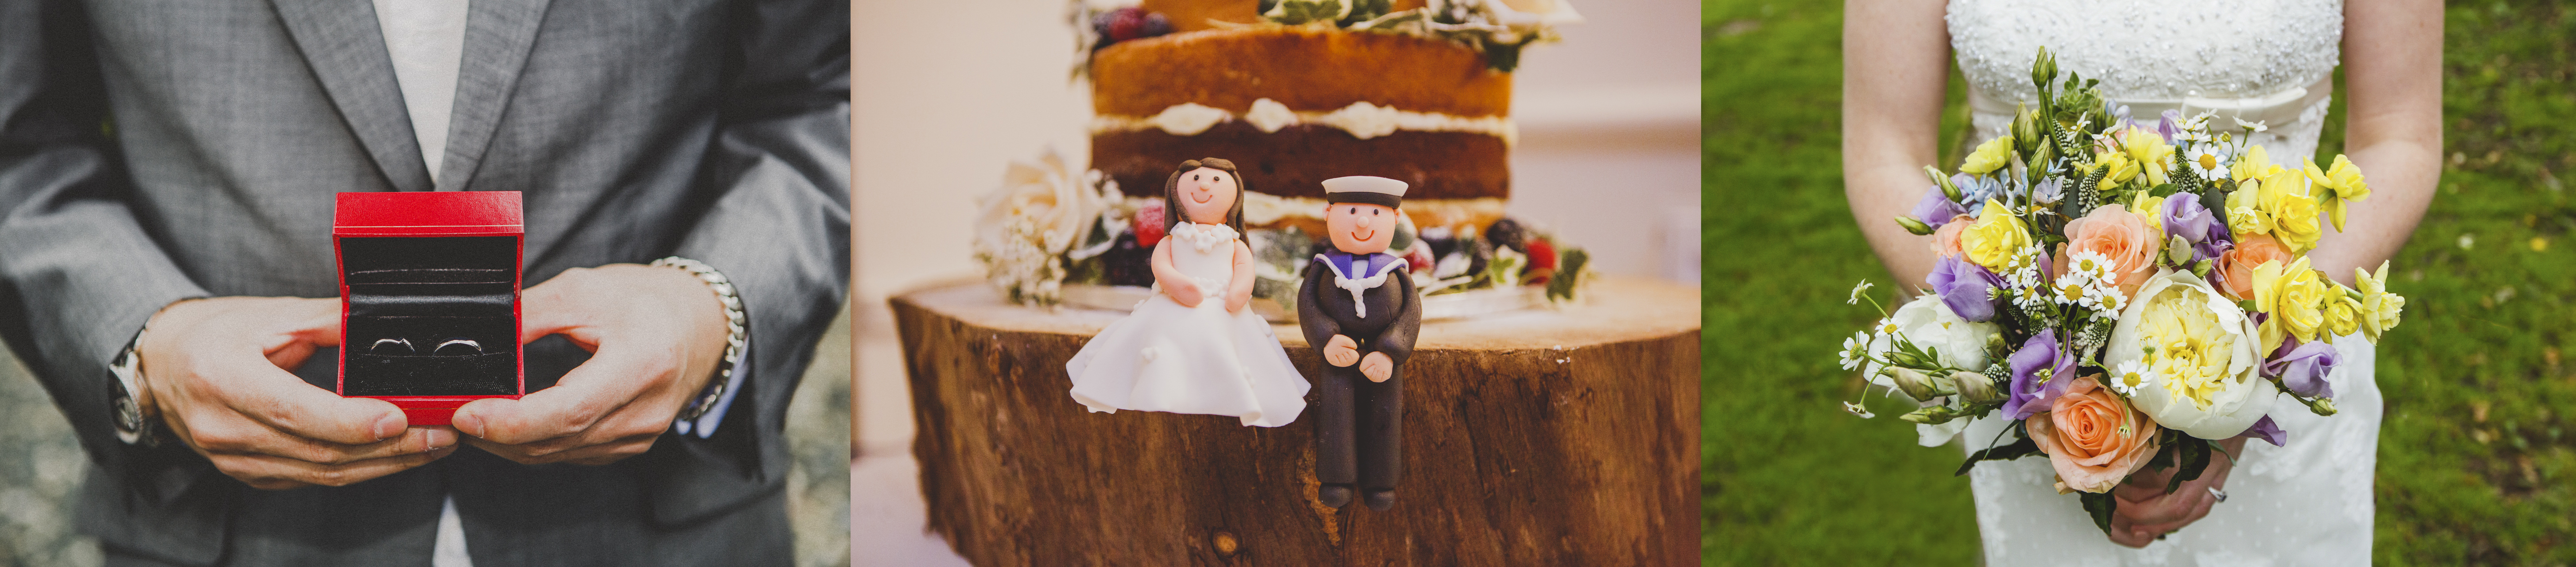 wedding photographer cornwall, wedding photographer devon,